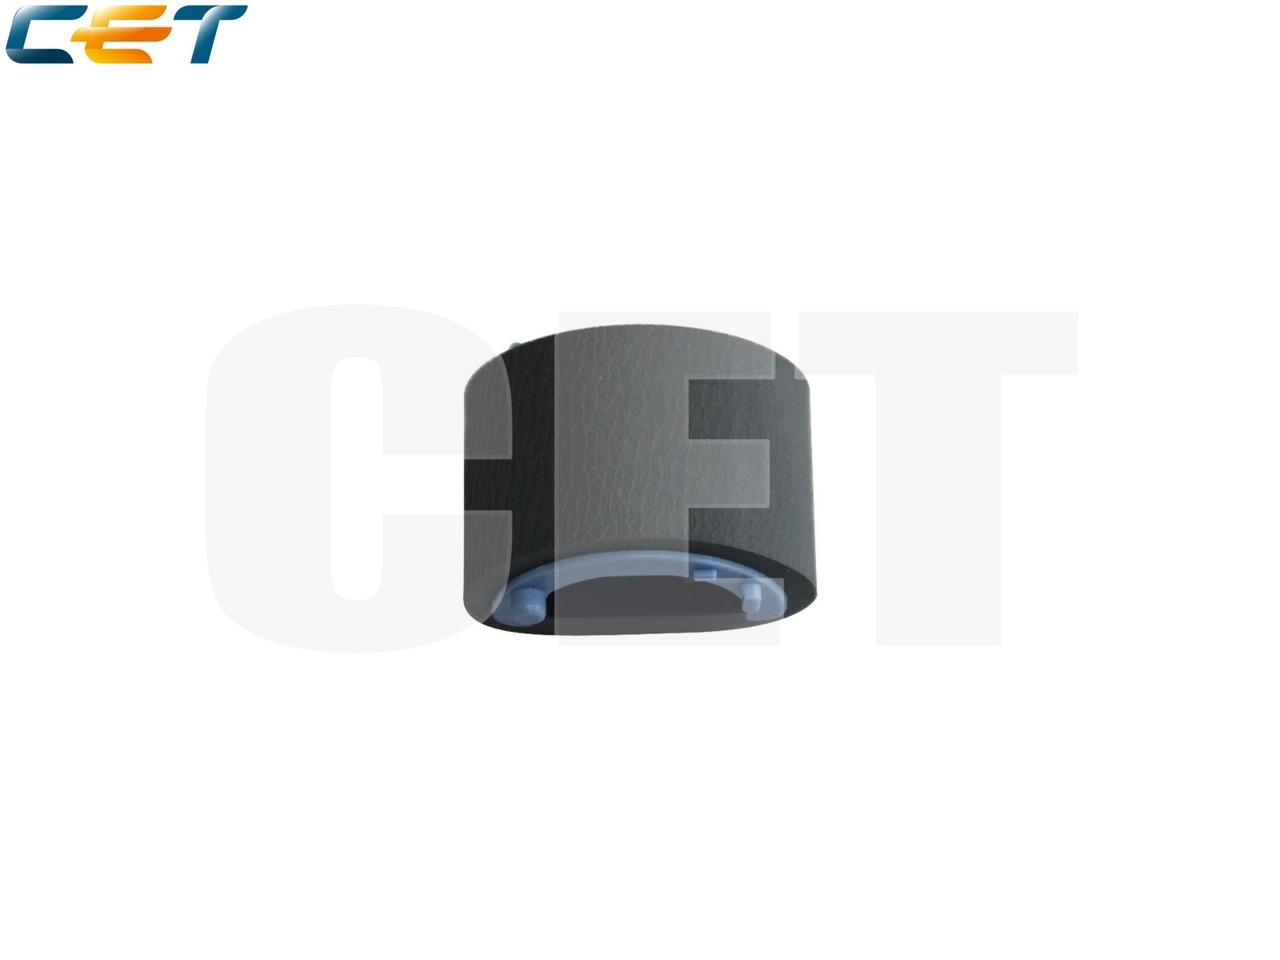 Ролик подхвата 1-го лотка RL1-0019-000 для HP LaserJet4200/4300/4250/4350 (CET), CET1068